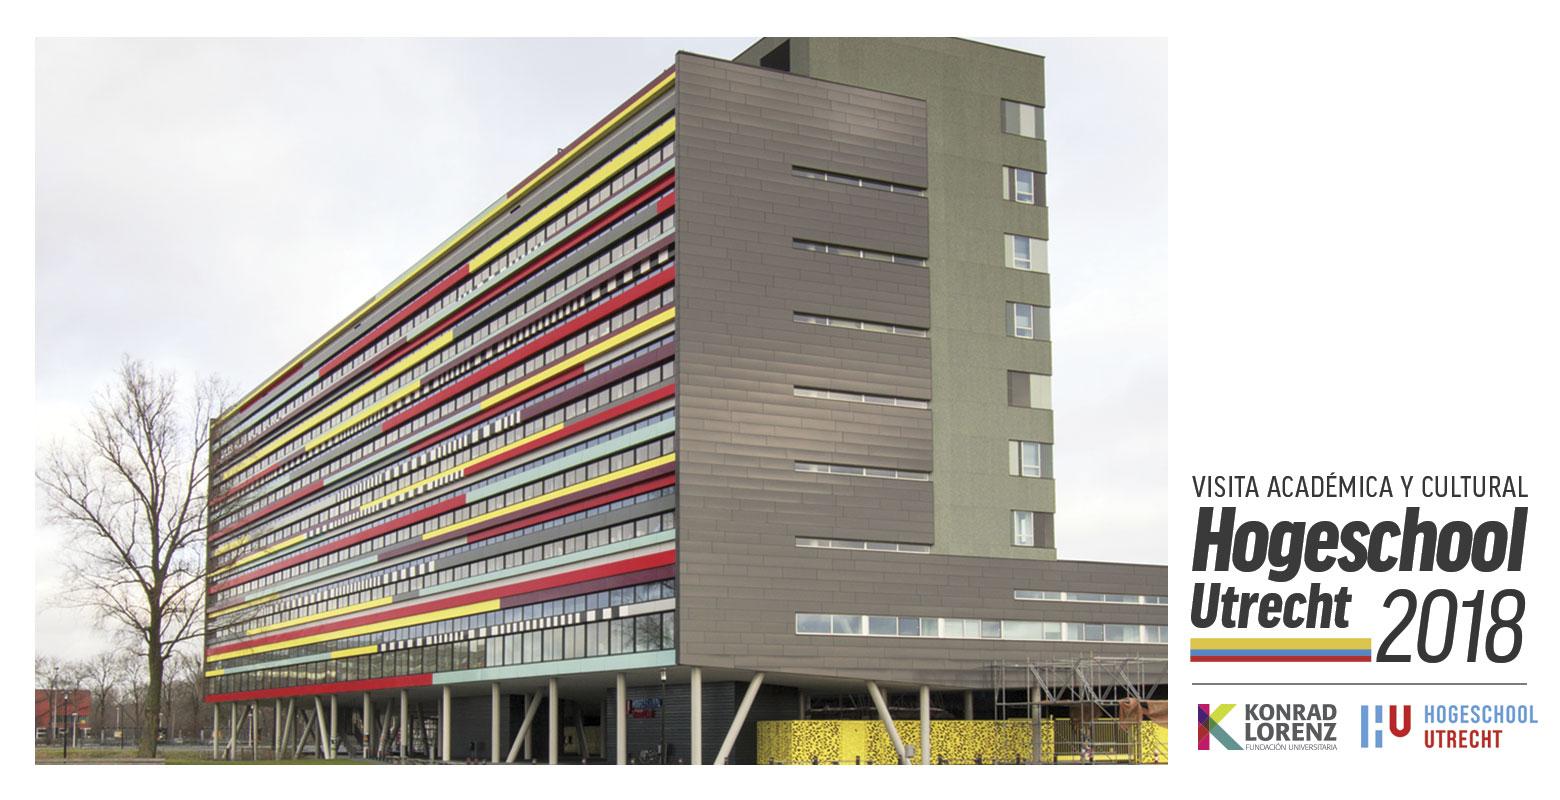 Visita Académica y Cultural Hogeschool Utrecht 2018-1